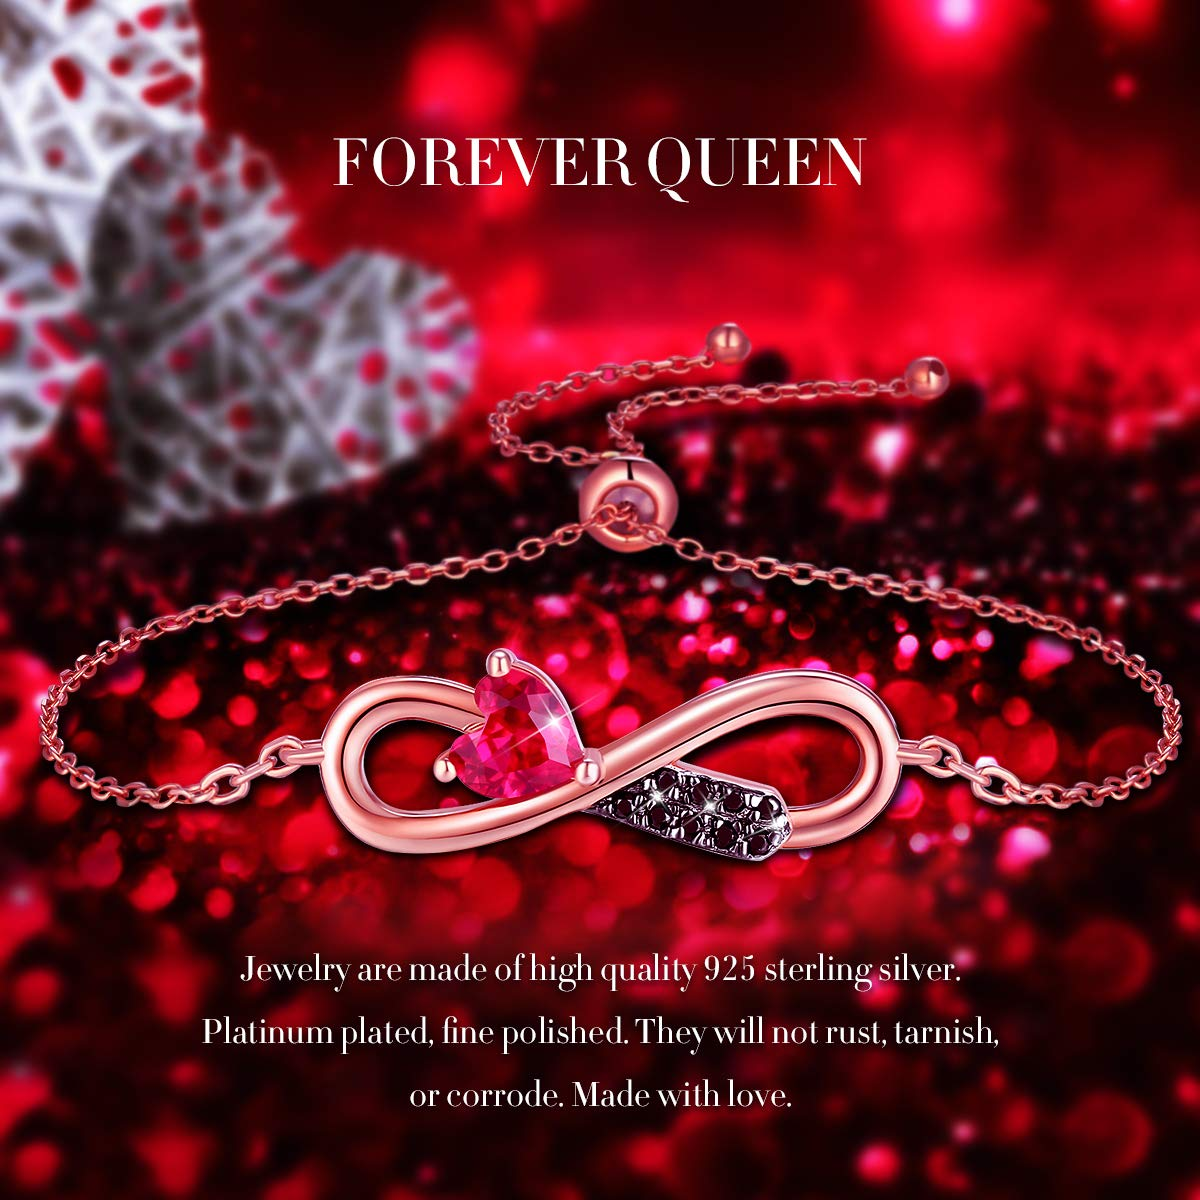 FOREVER QUEEN Infinity Bracelet Adjustable Bracelet for Women Girls 925 Sterling Silver 18K Gold Plated Bangle Bracelet Mothers Day Jewelry Gift